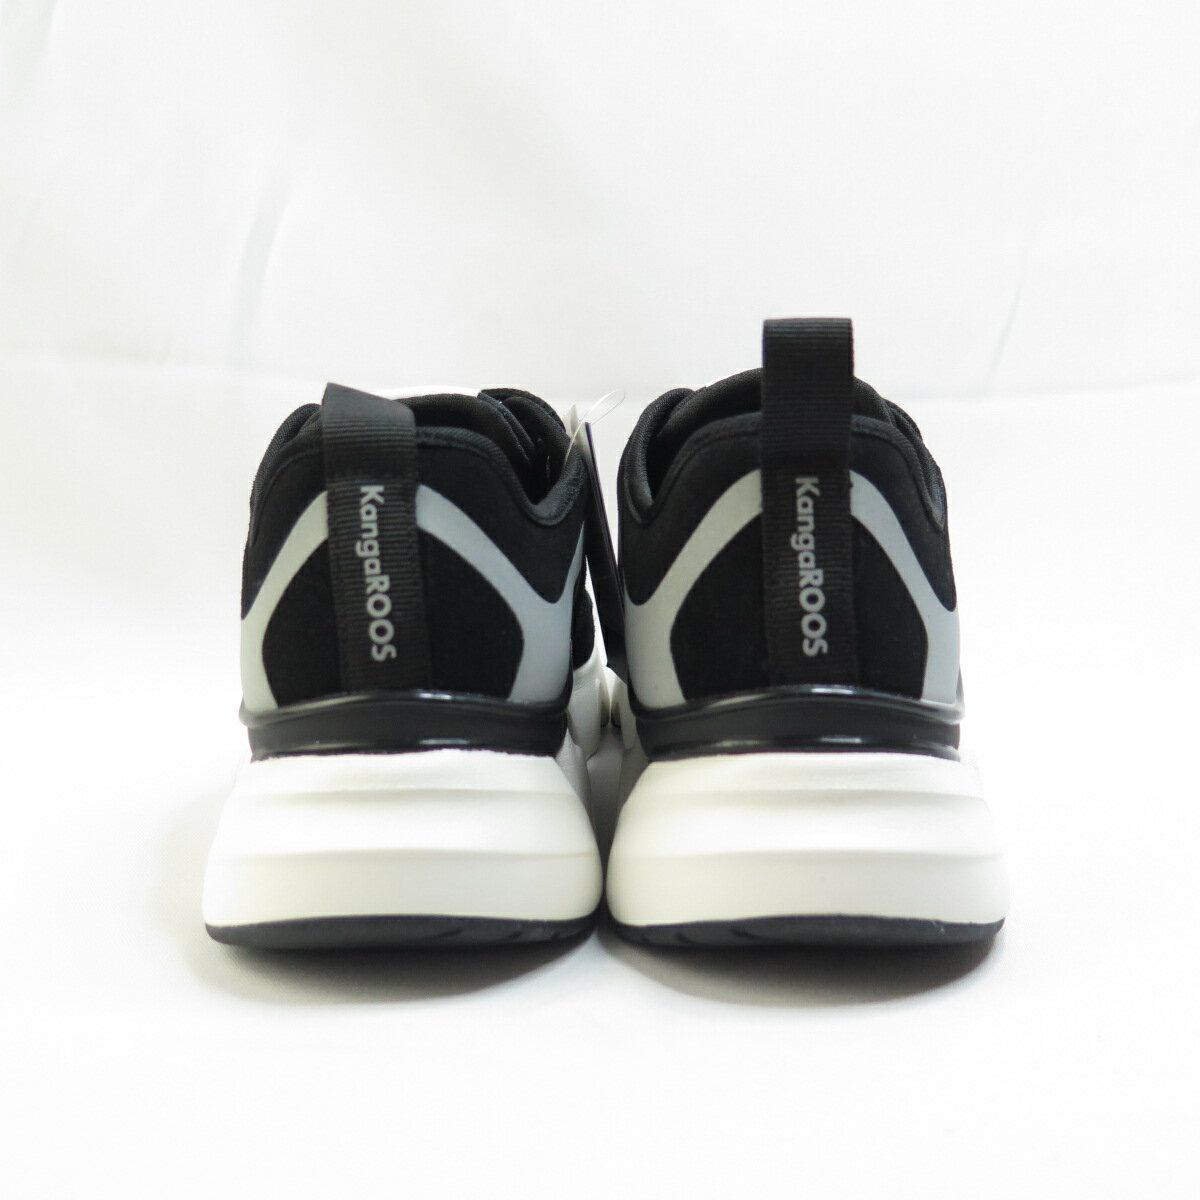 KangaROOS 袋鼠 GROOVE II 復古休閒鞋 KW11260 女款 黑白【iSport愛運動】